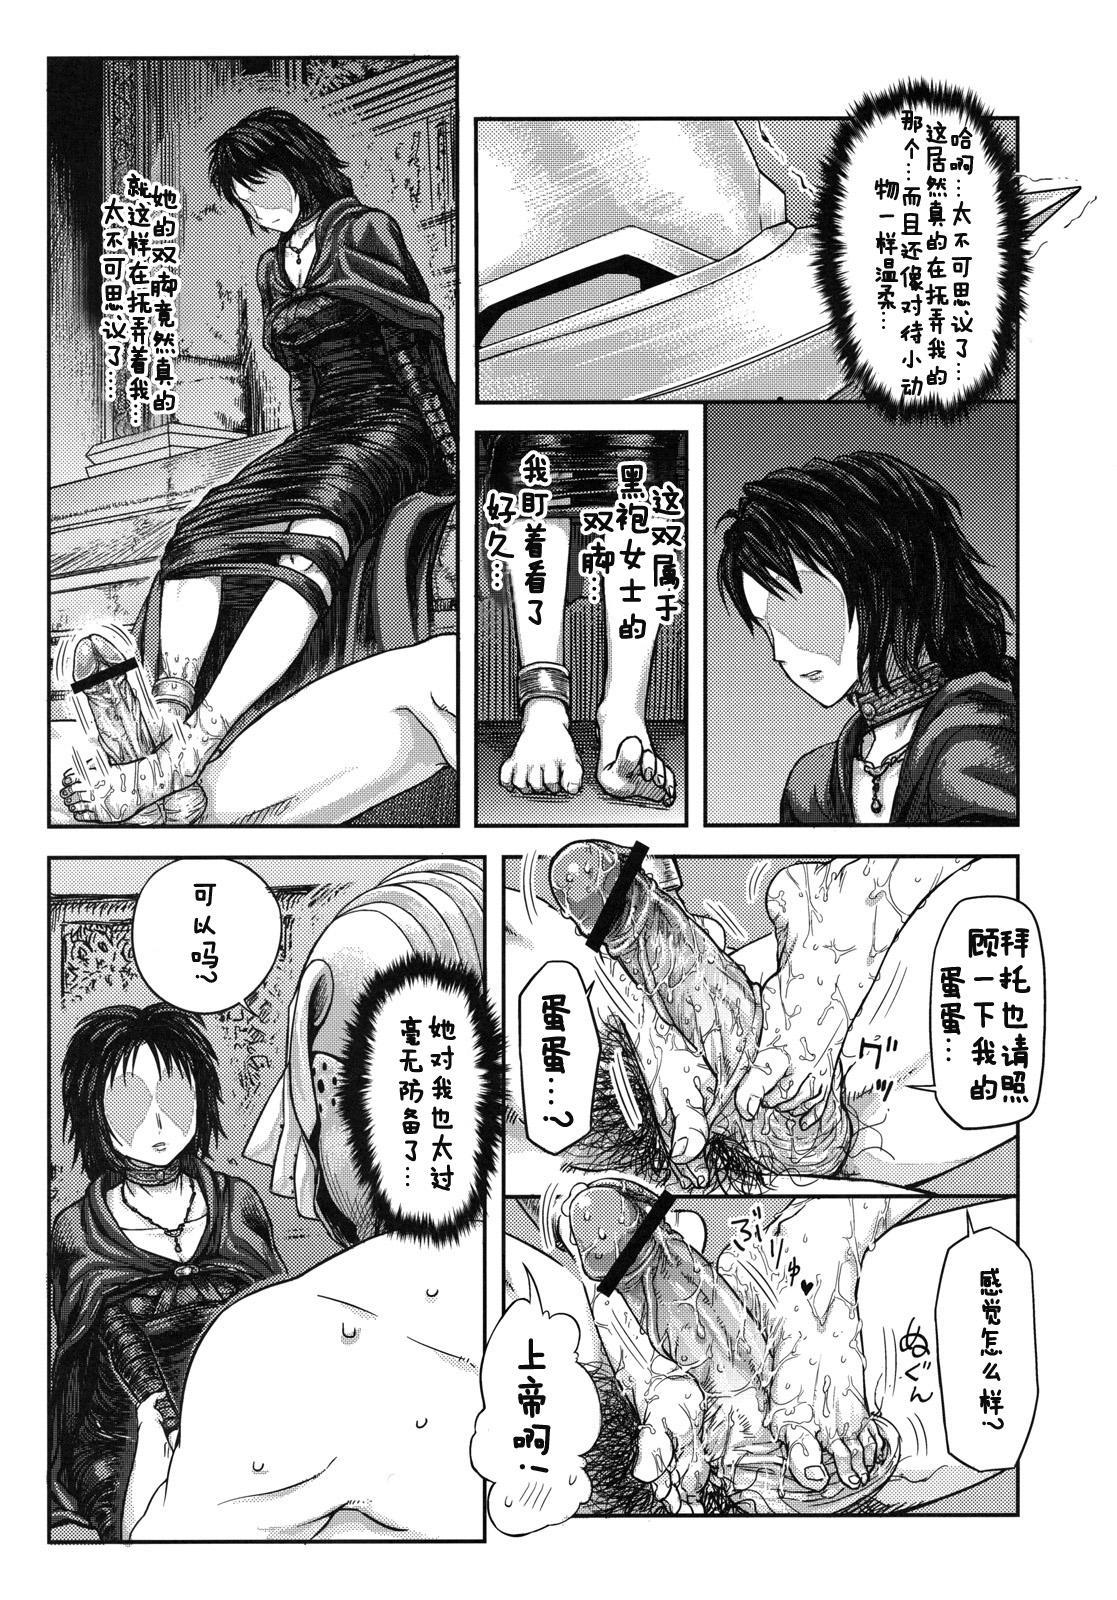 Kono Saki, Ashi ni Chuuishiro | Be Wary of Feet Ahead 10